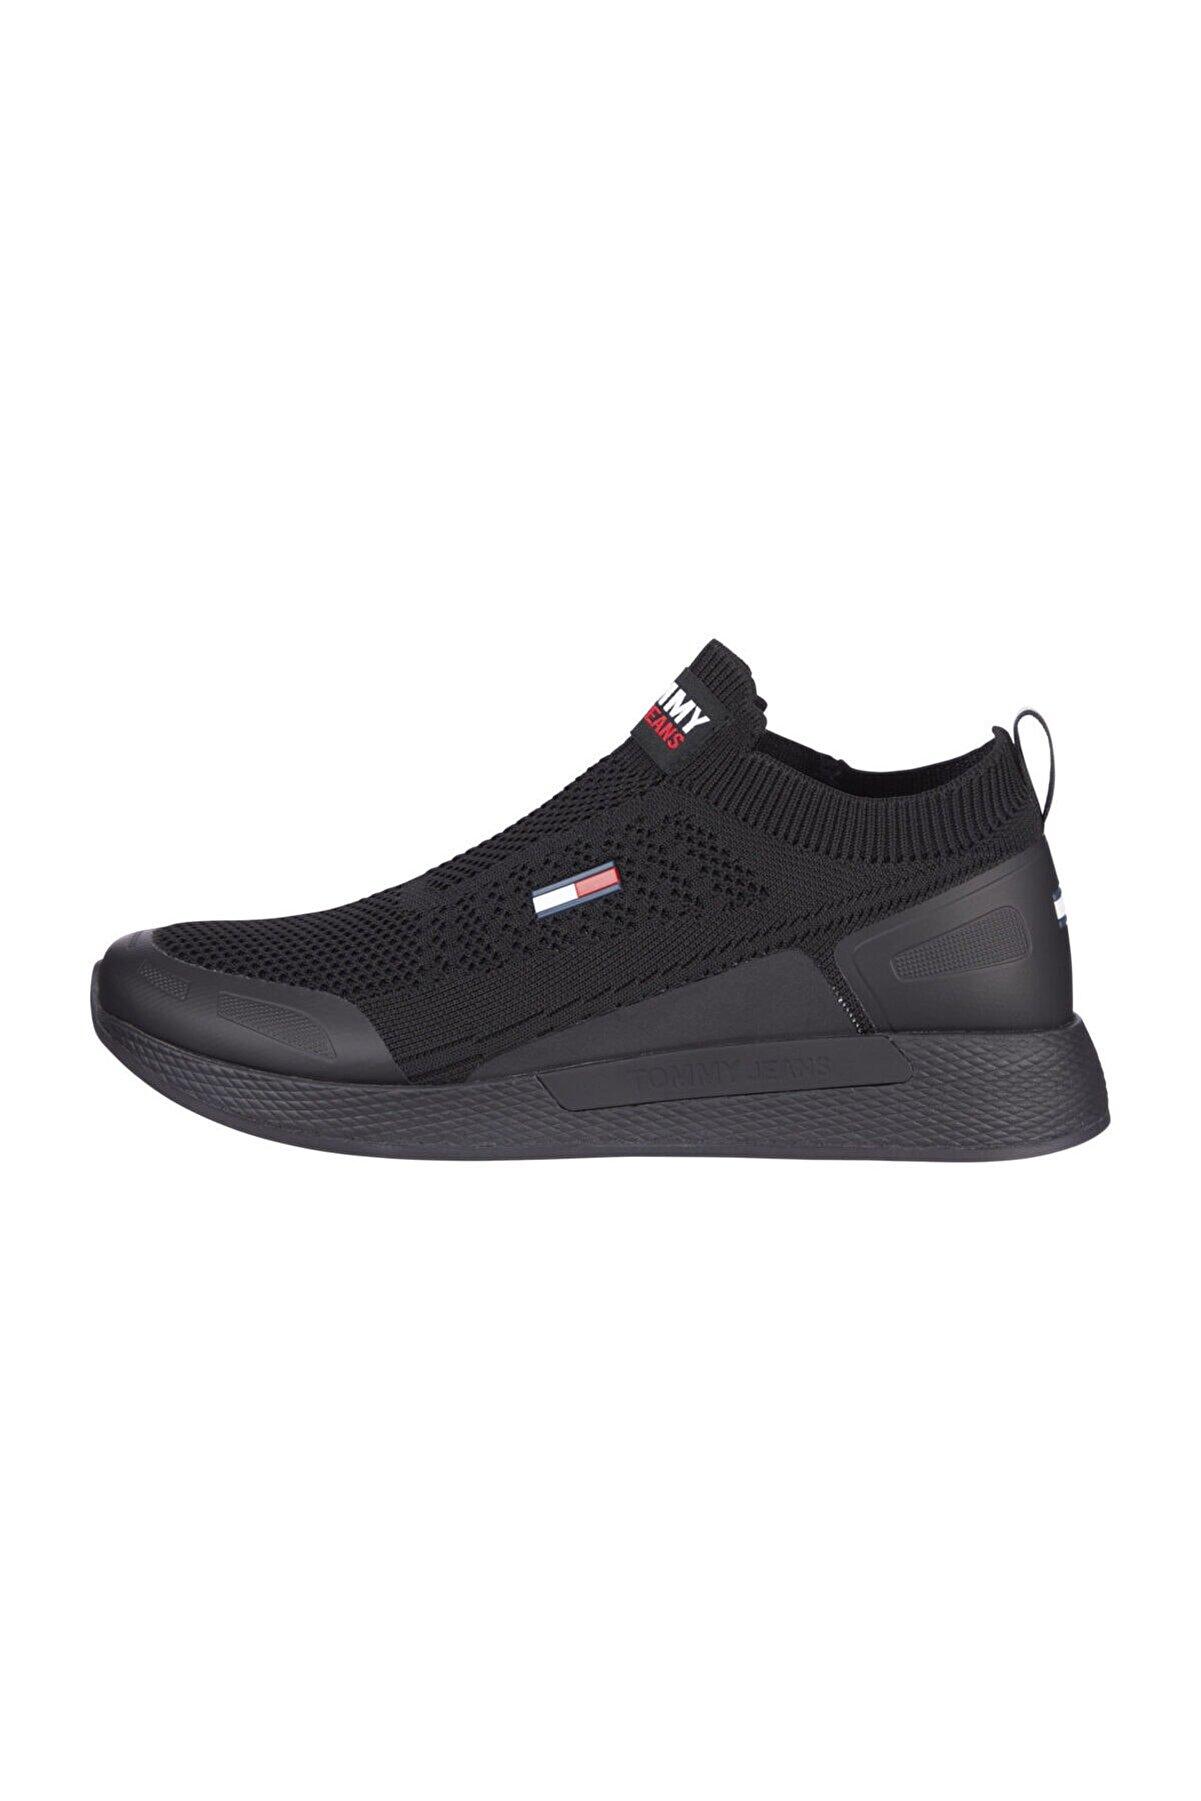 Tommy Hilfiger Erkek Siyah Sneaker EM0EM00664